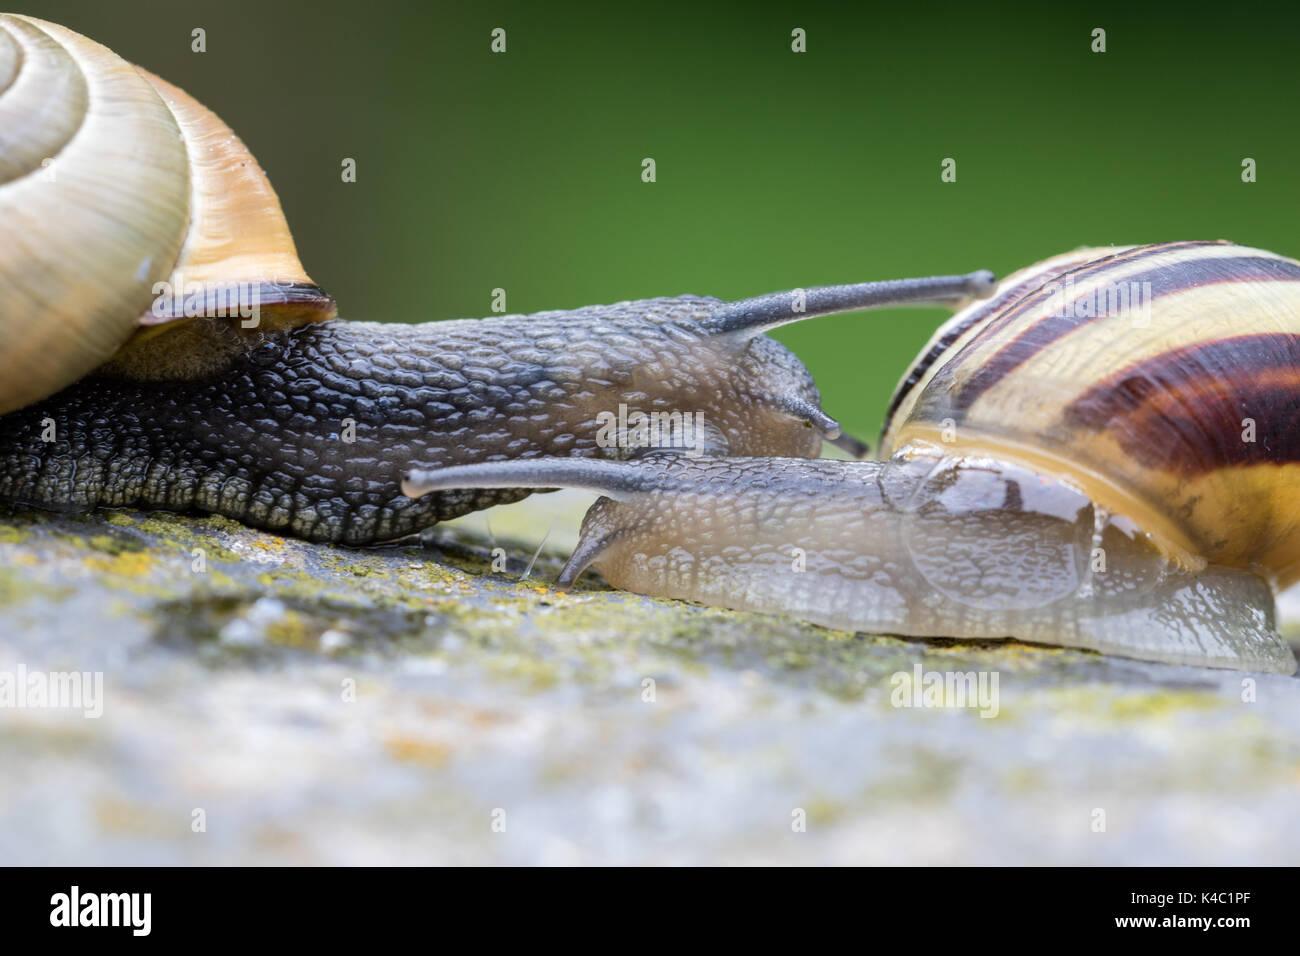 land snails stock photos u0026 land snails stock images alamy